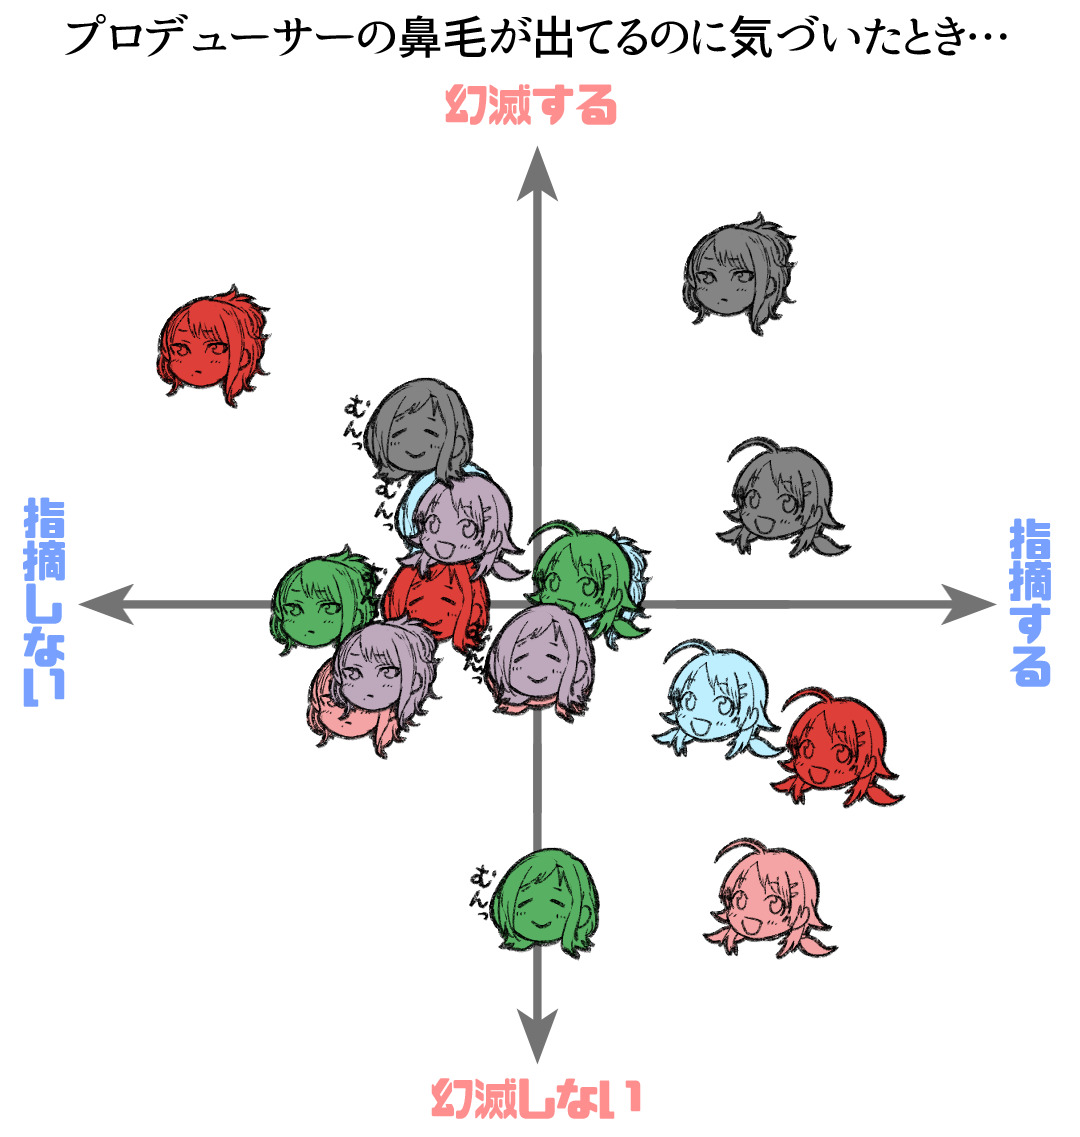 f:id:hoshi_sano:20200414113804j:image:w400